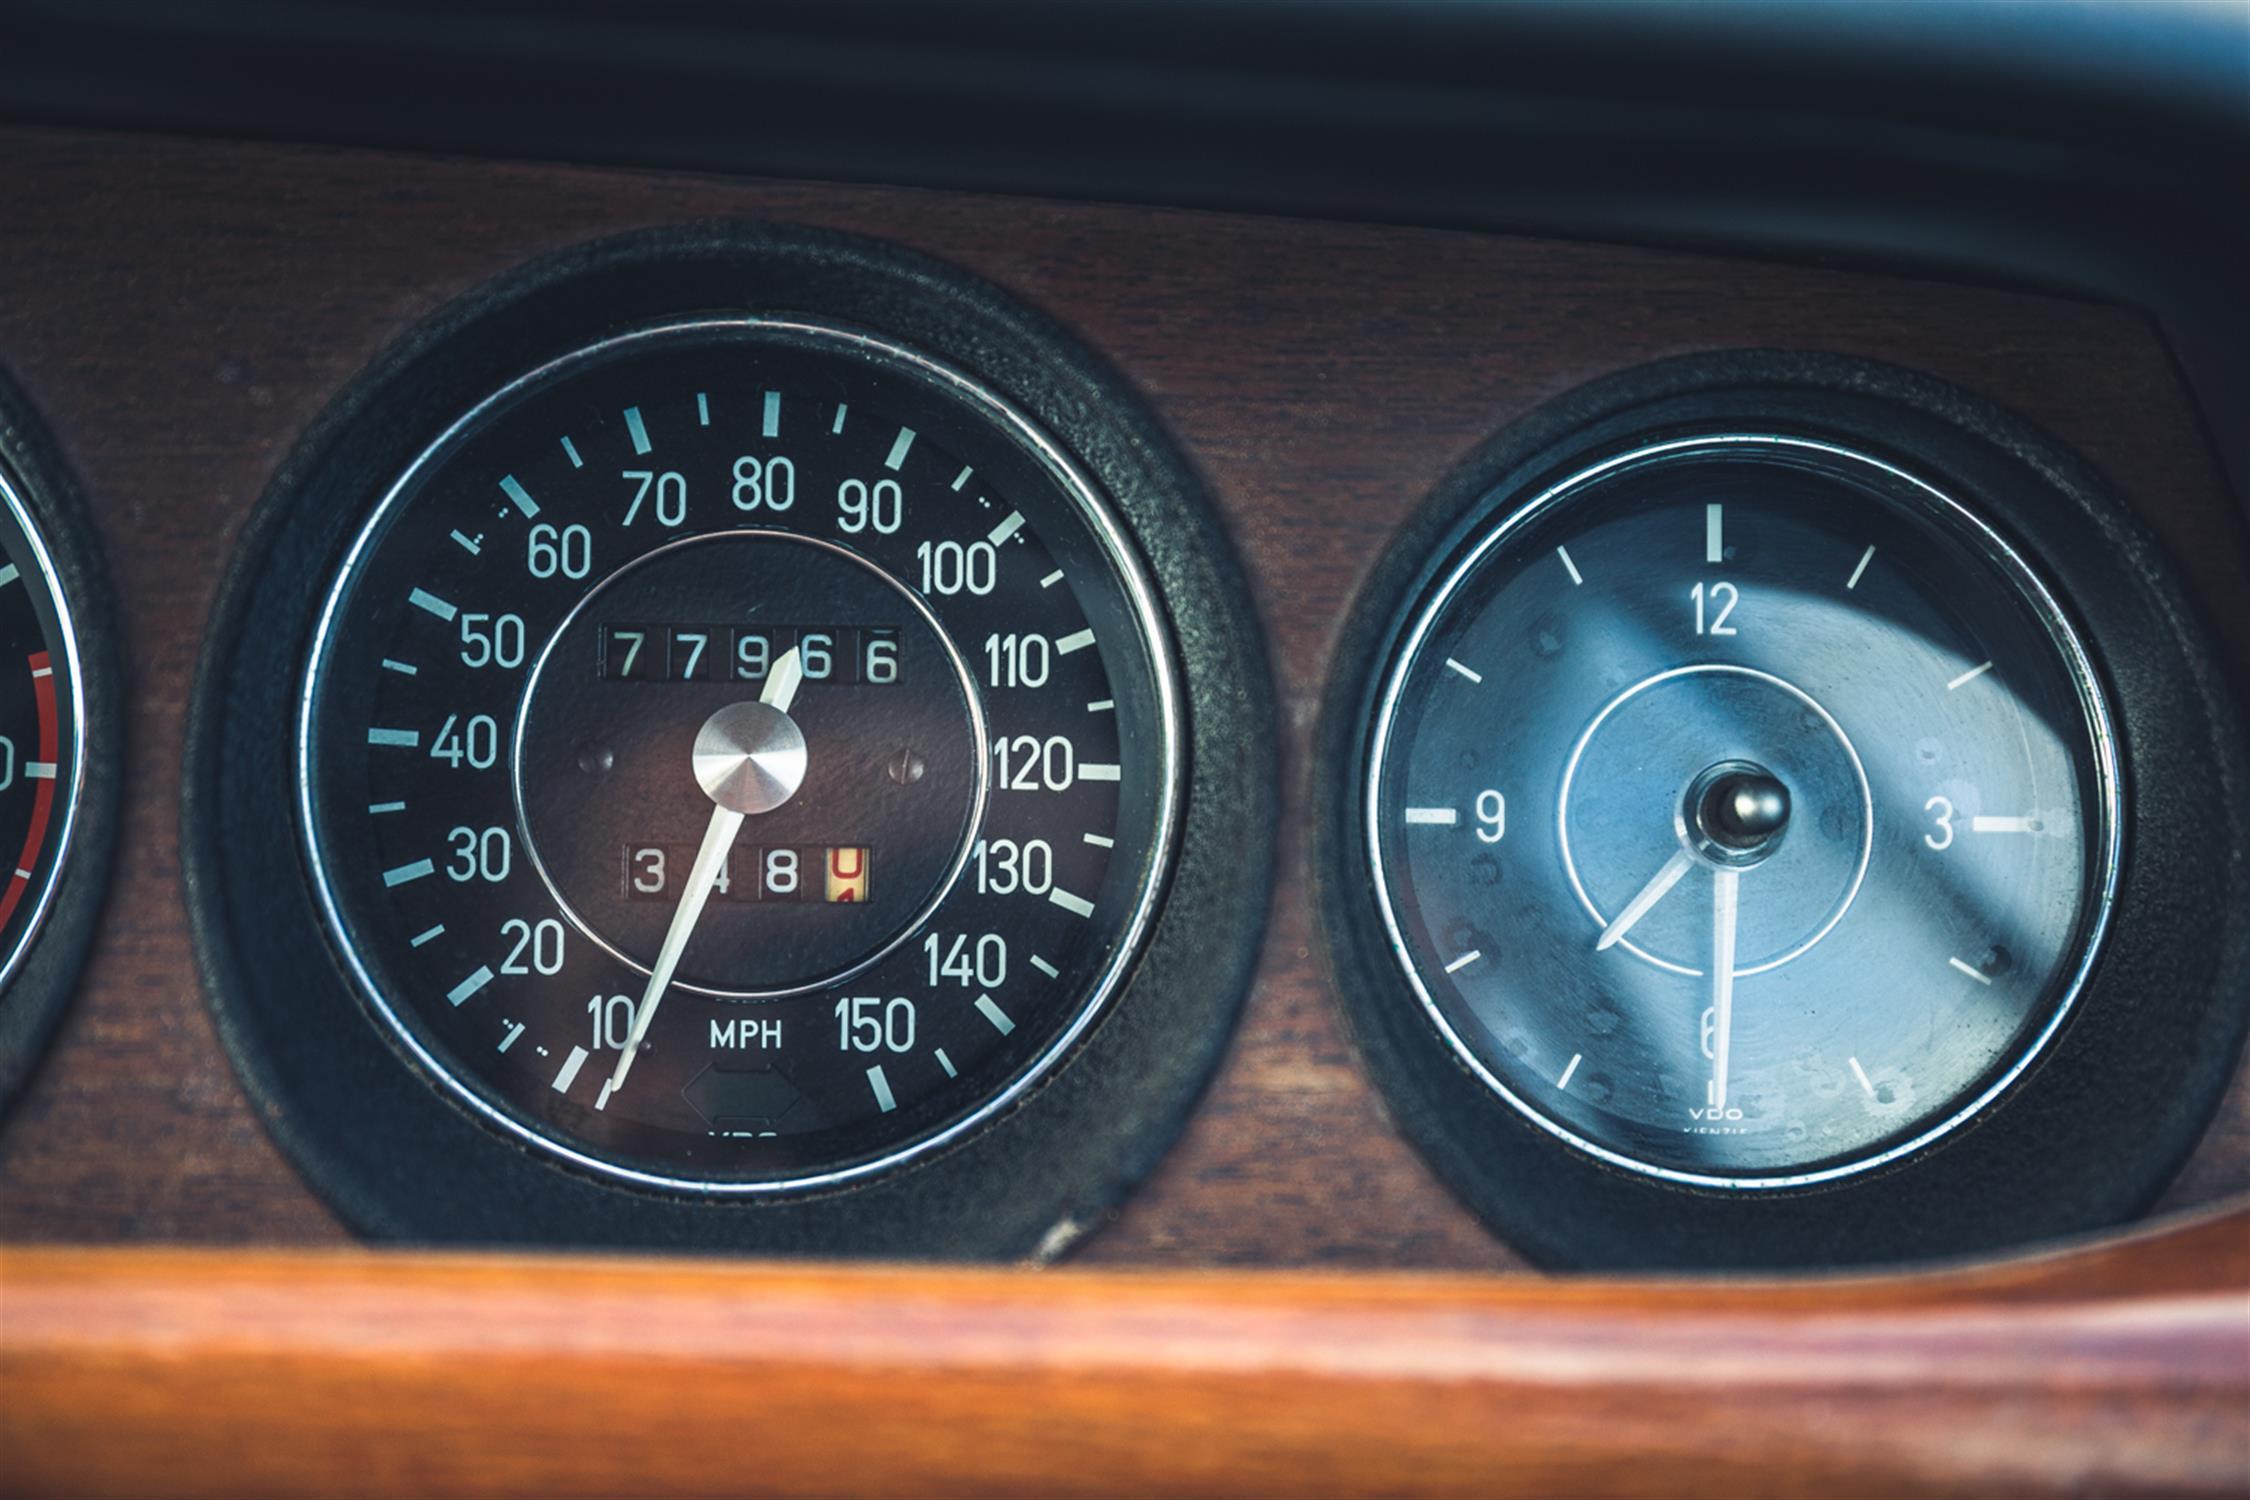 1973 BMW 3.0 CSL - Image 5 of 10